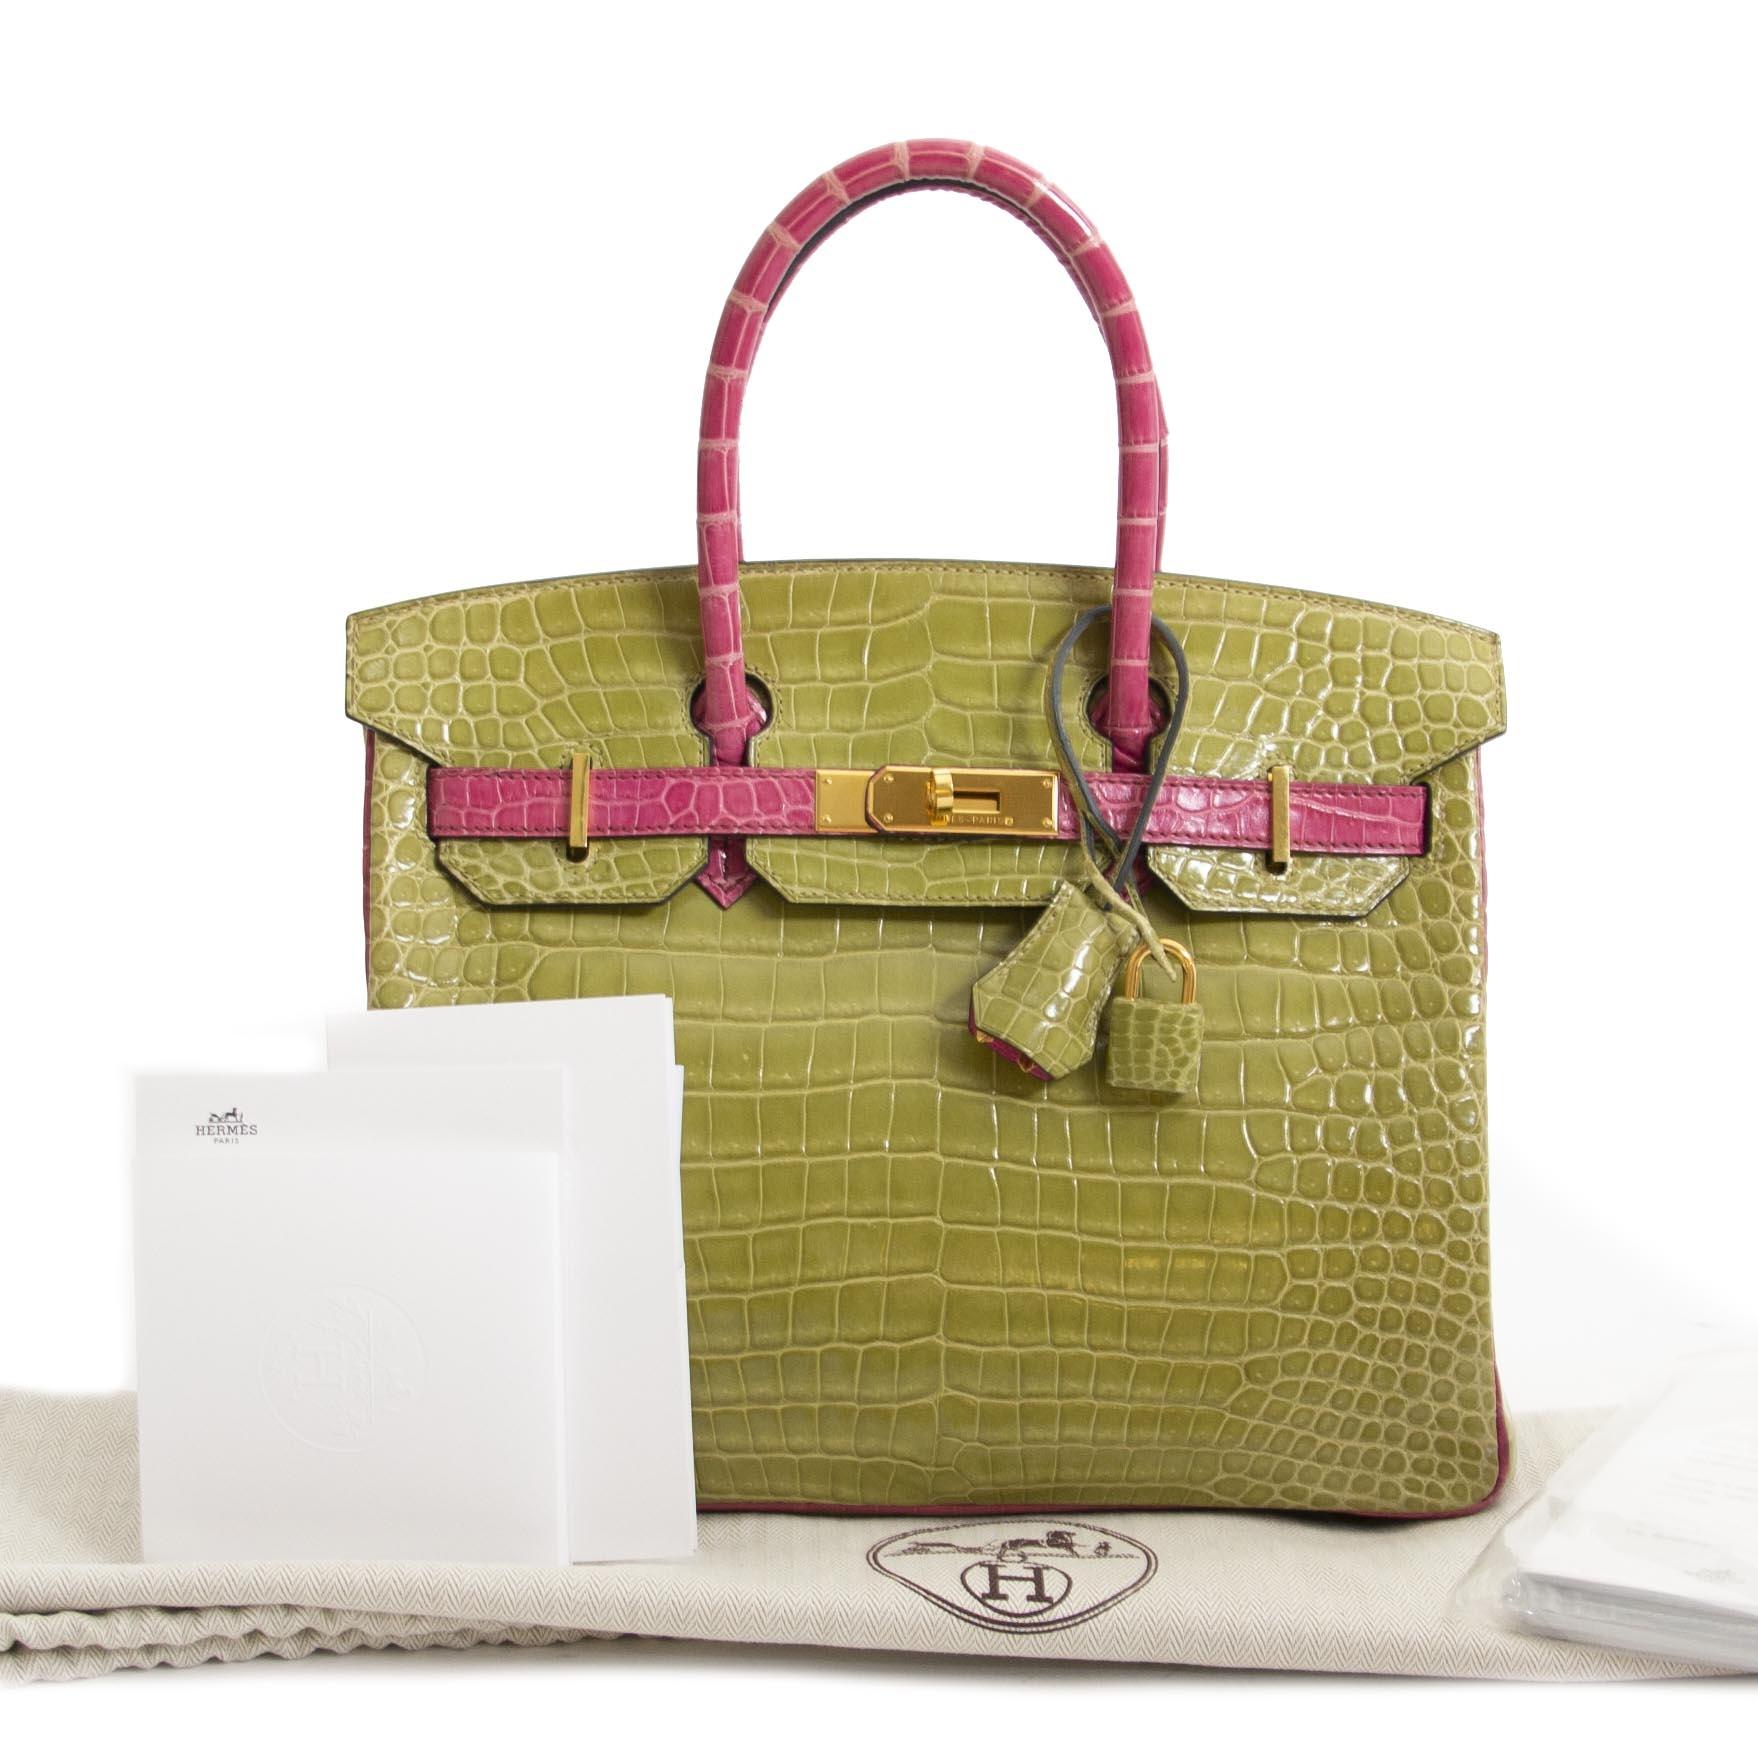 4b19ff7001b4 ... Are you looking for a 100% authentic Hermès Birkin 30 Crocodile Porosus  GHW Vert Anis